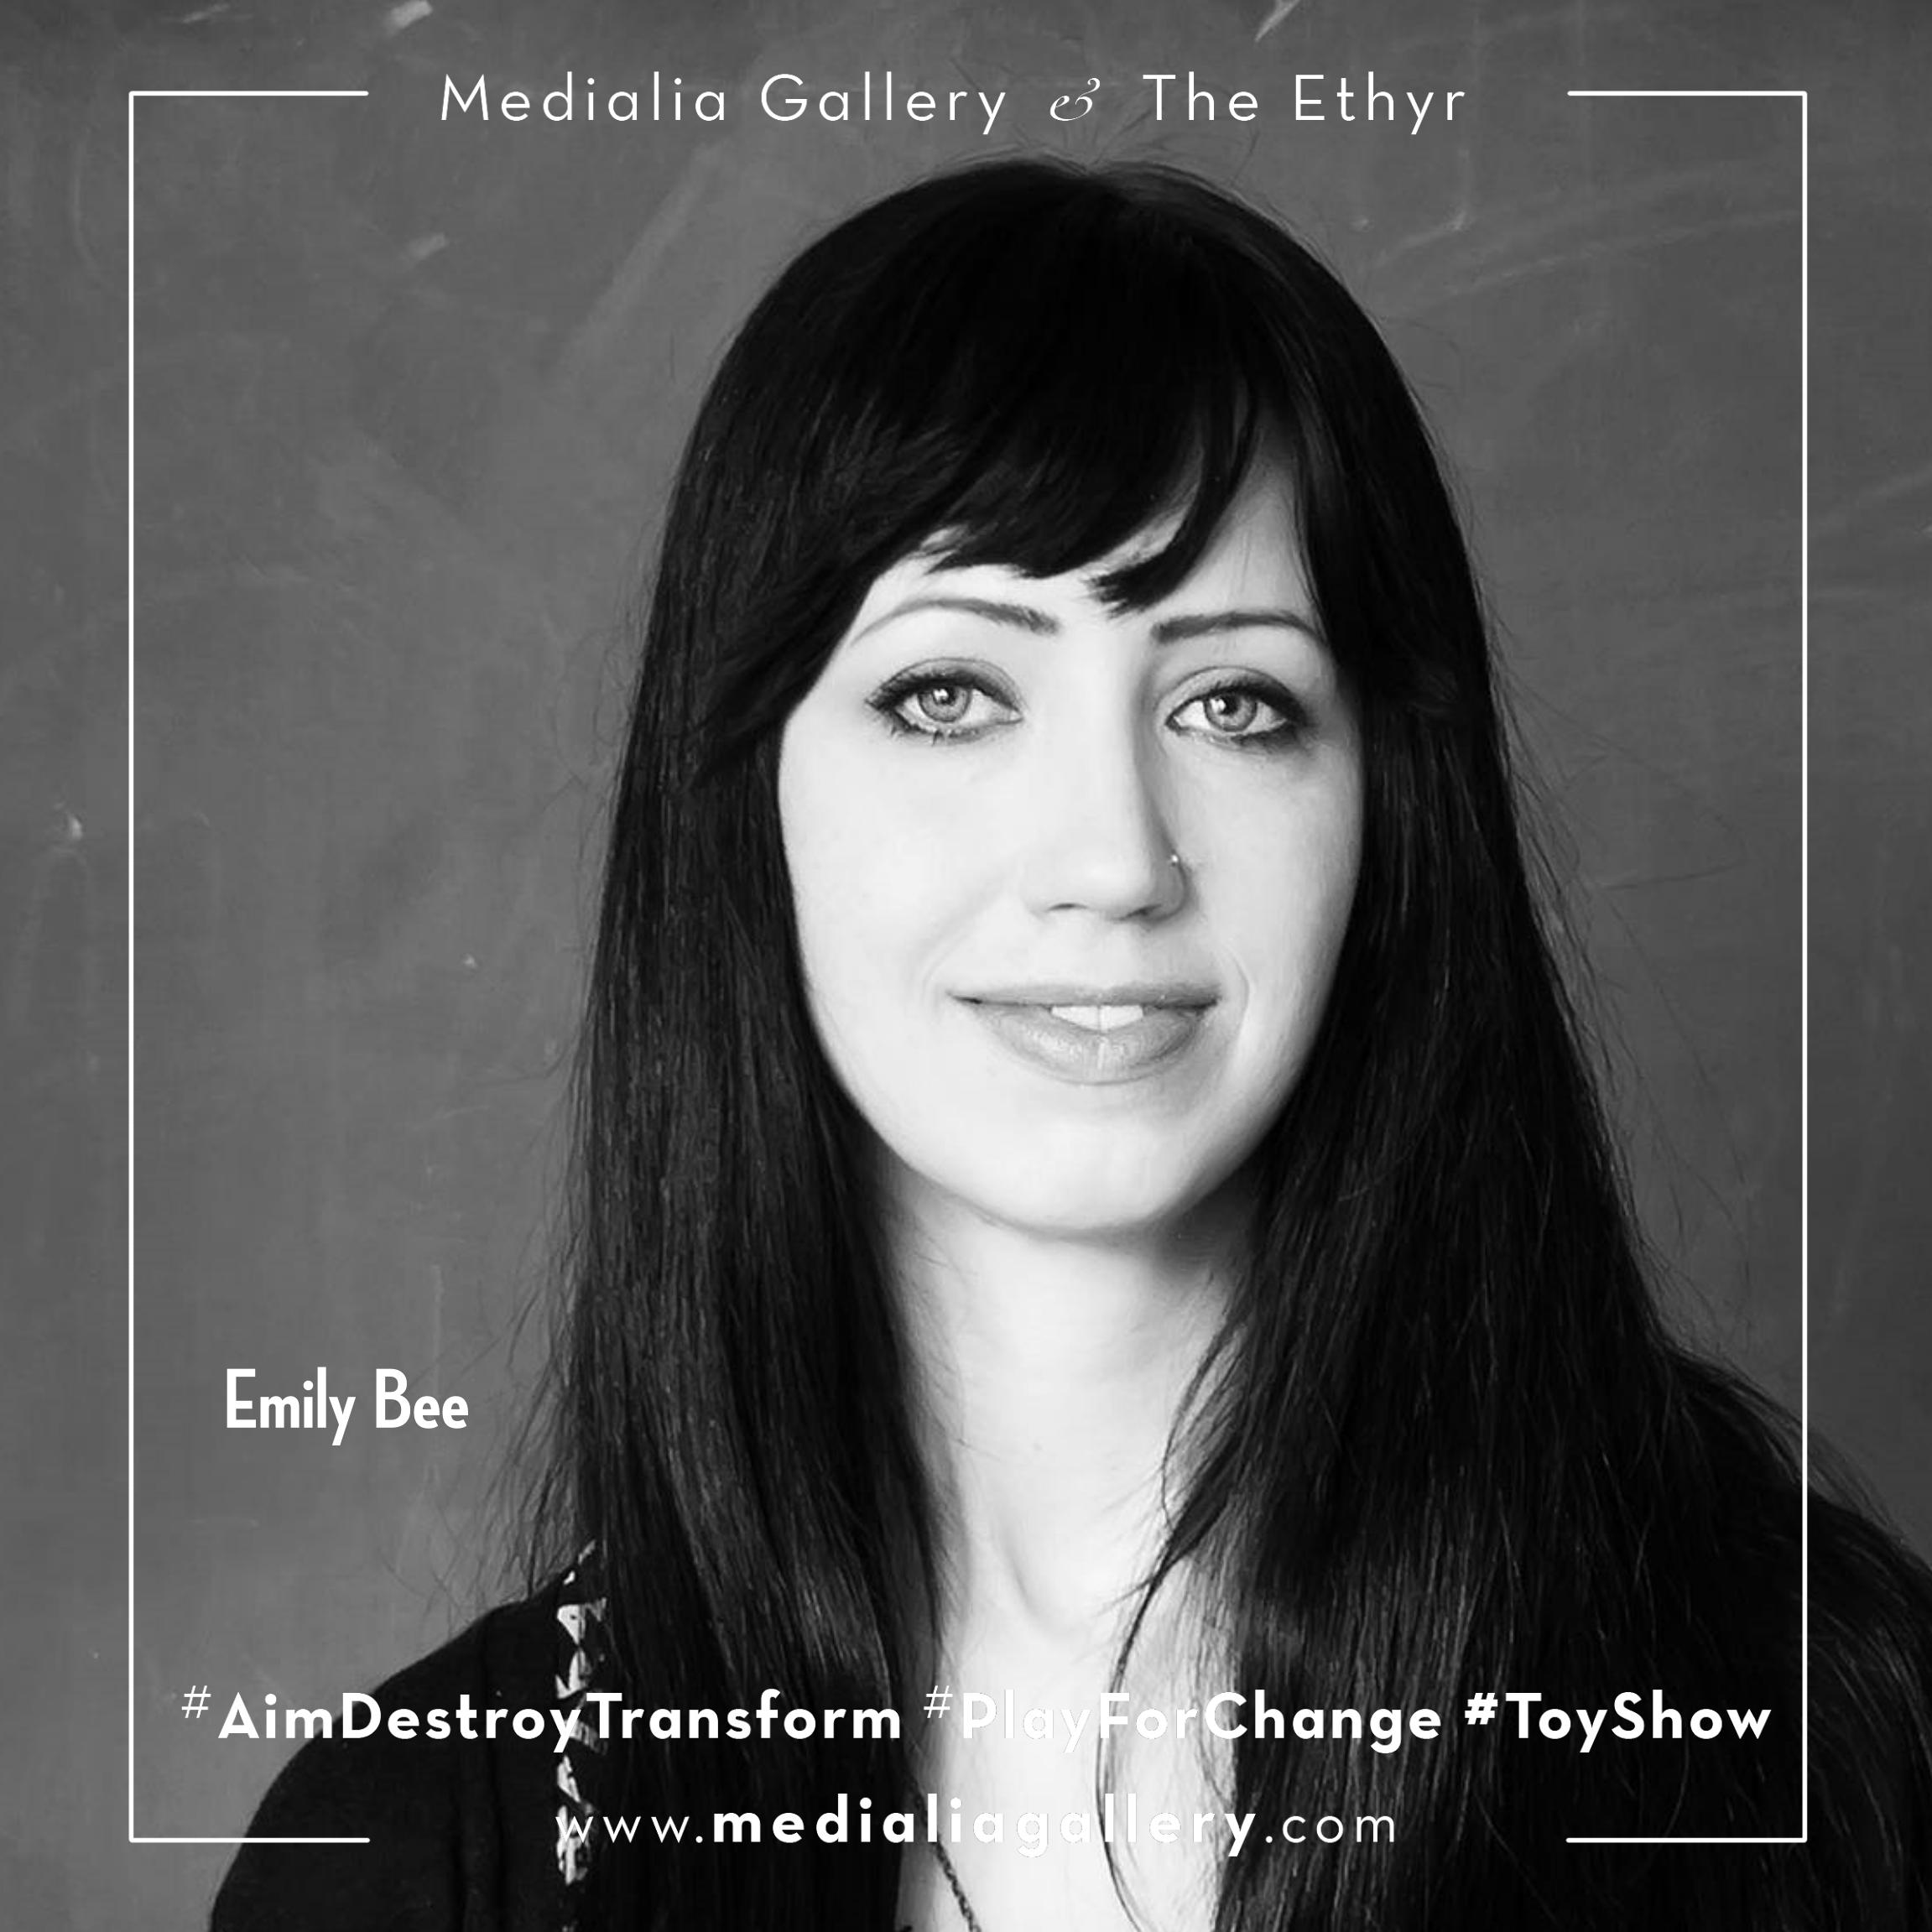 MedialiaGallery_The_Ethyr_AimDestroyTransform_Toy_Show_Emily_Bee_Shock_OBOTs_II_November_2017.jpg.png